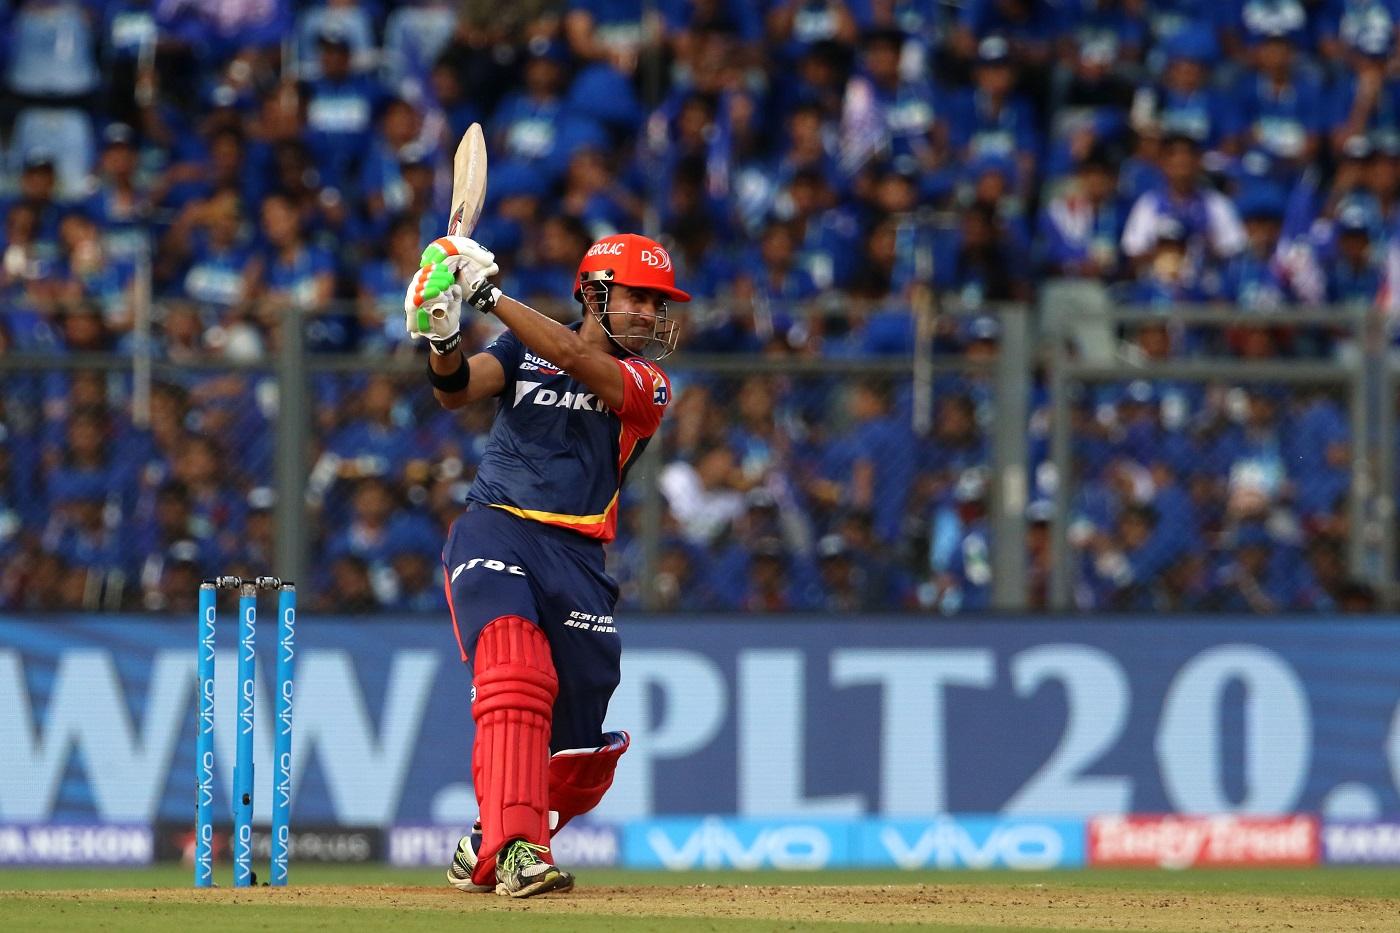 IPL 2018: Sanjay Manjrekar Defends Gautam Gambhir After Delhi Daredevils' Poor Show